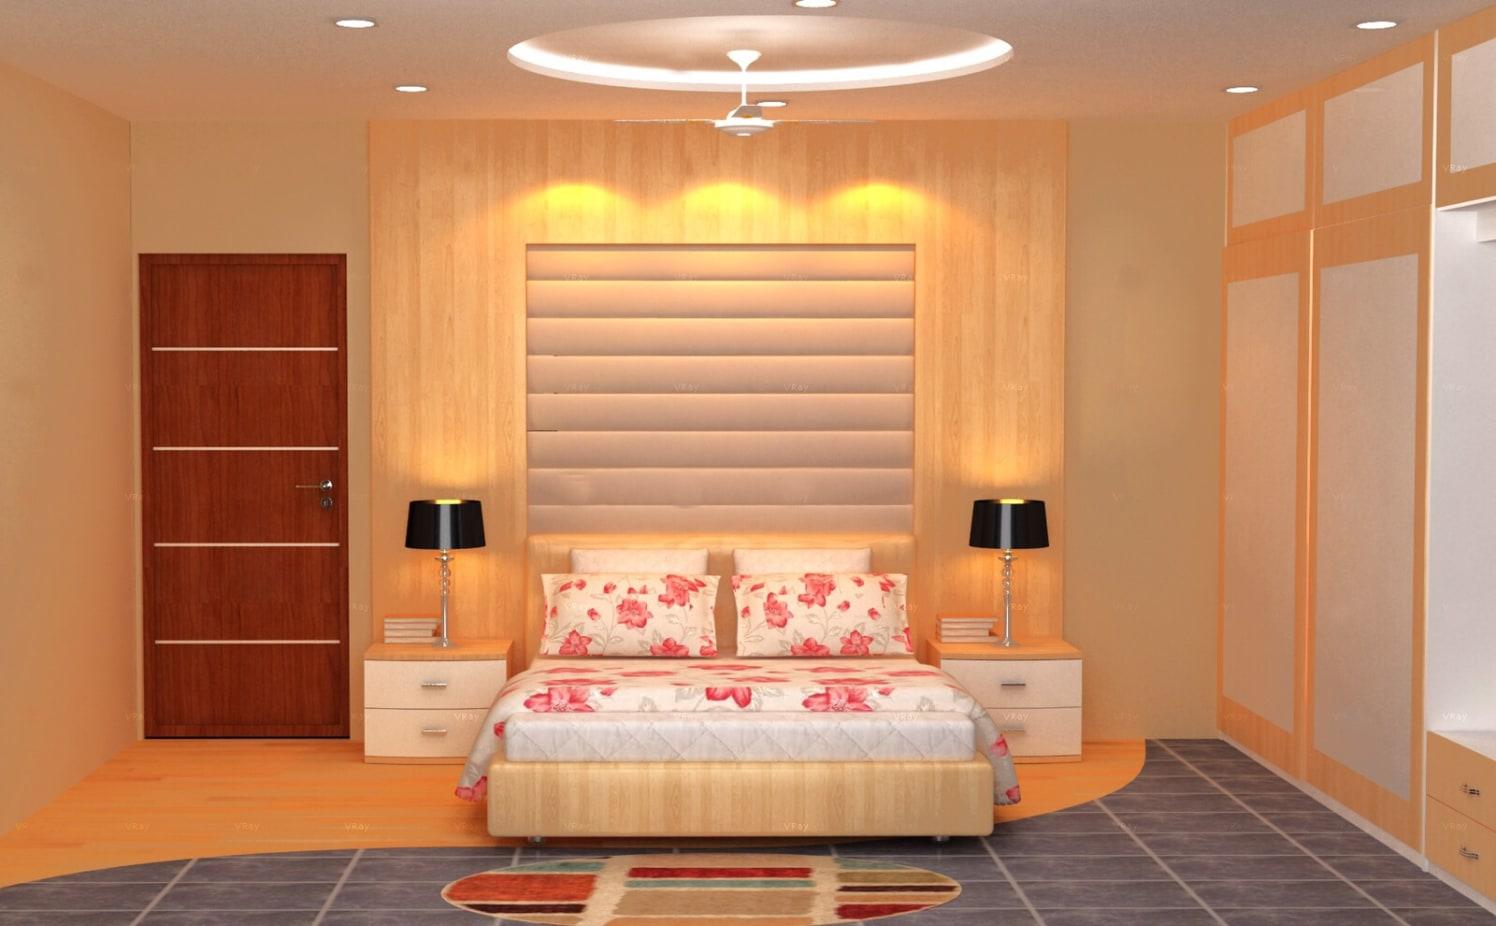 Contemporary bedroom design by The Midas Touch Interiors Bedroom | Interior Design Photos & Ideas